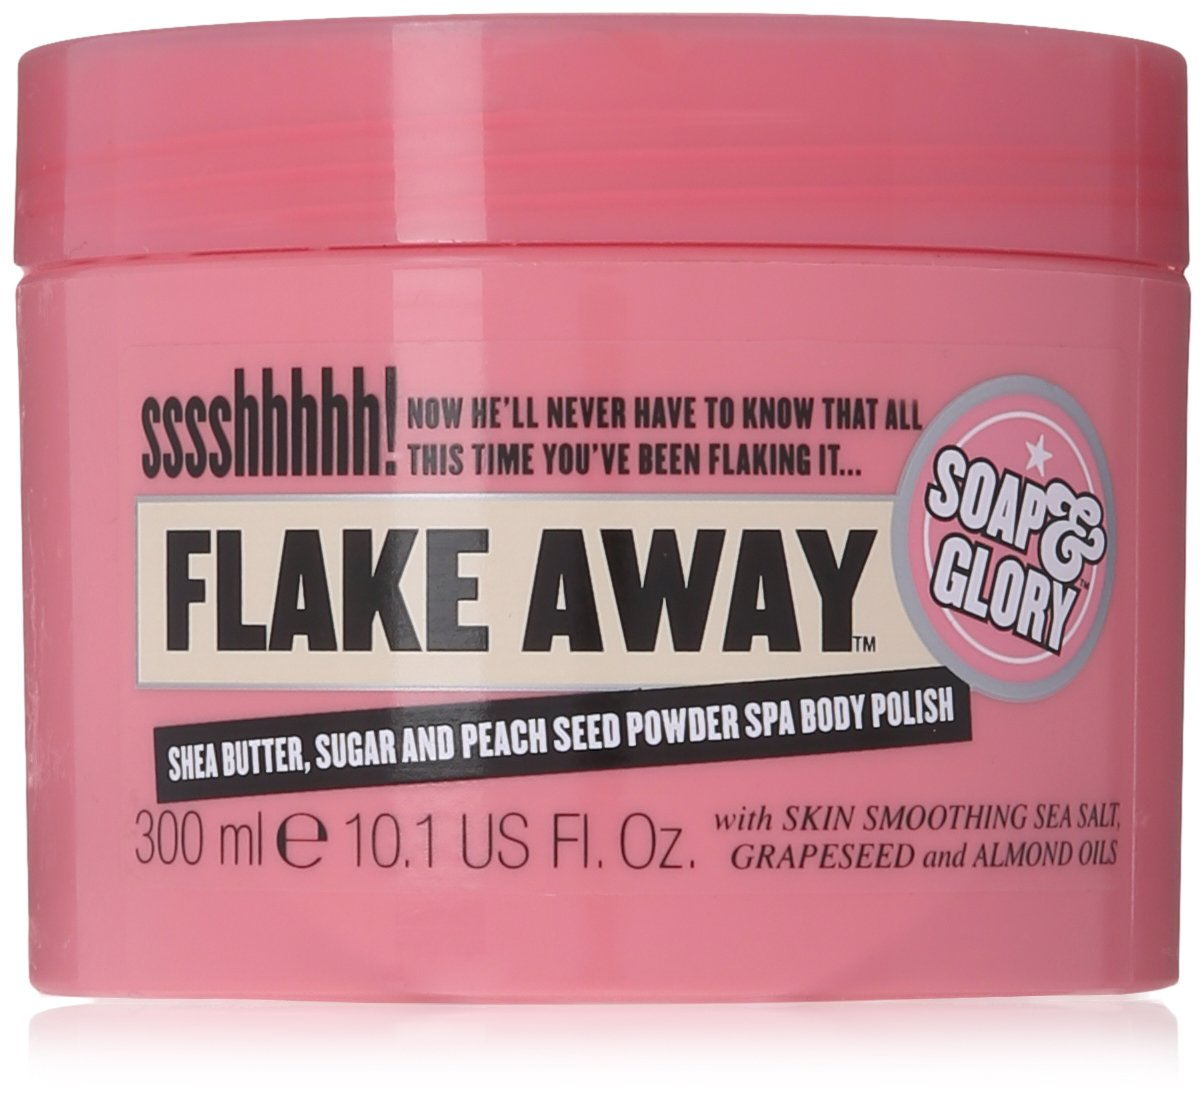 Soap & Glory Flake Away Body Scrub 300Ml by Soap & Glory